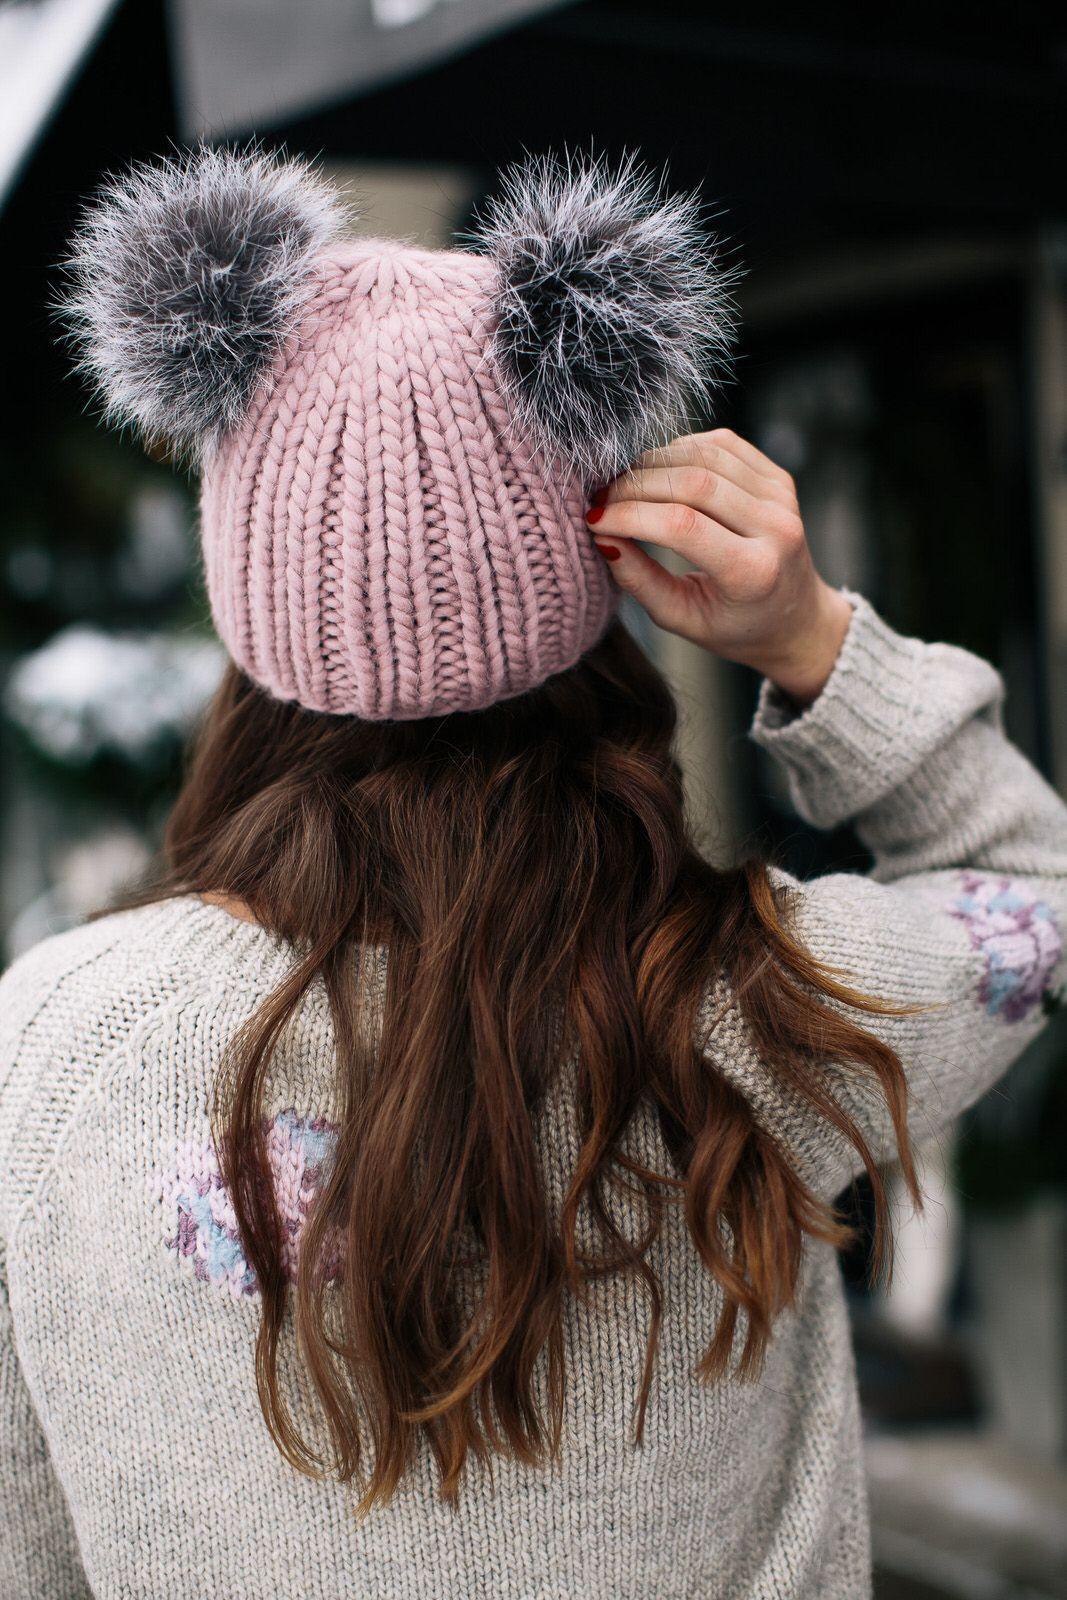 dbabaa4ae003fe Cute Double Pom Pom Beanies Hats Winter Fall Fashion Accessory.  #ilymixaccessories #fallfashion #winterfashion #outfits Casual chic street  style.